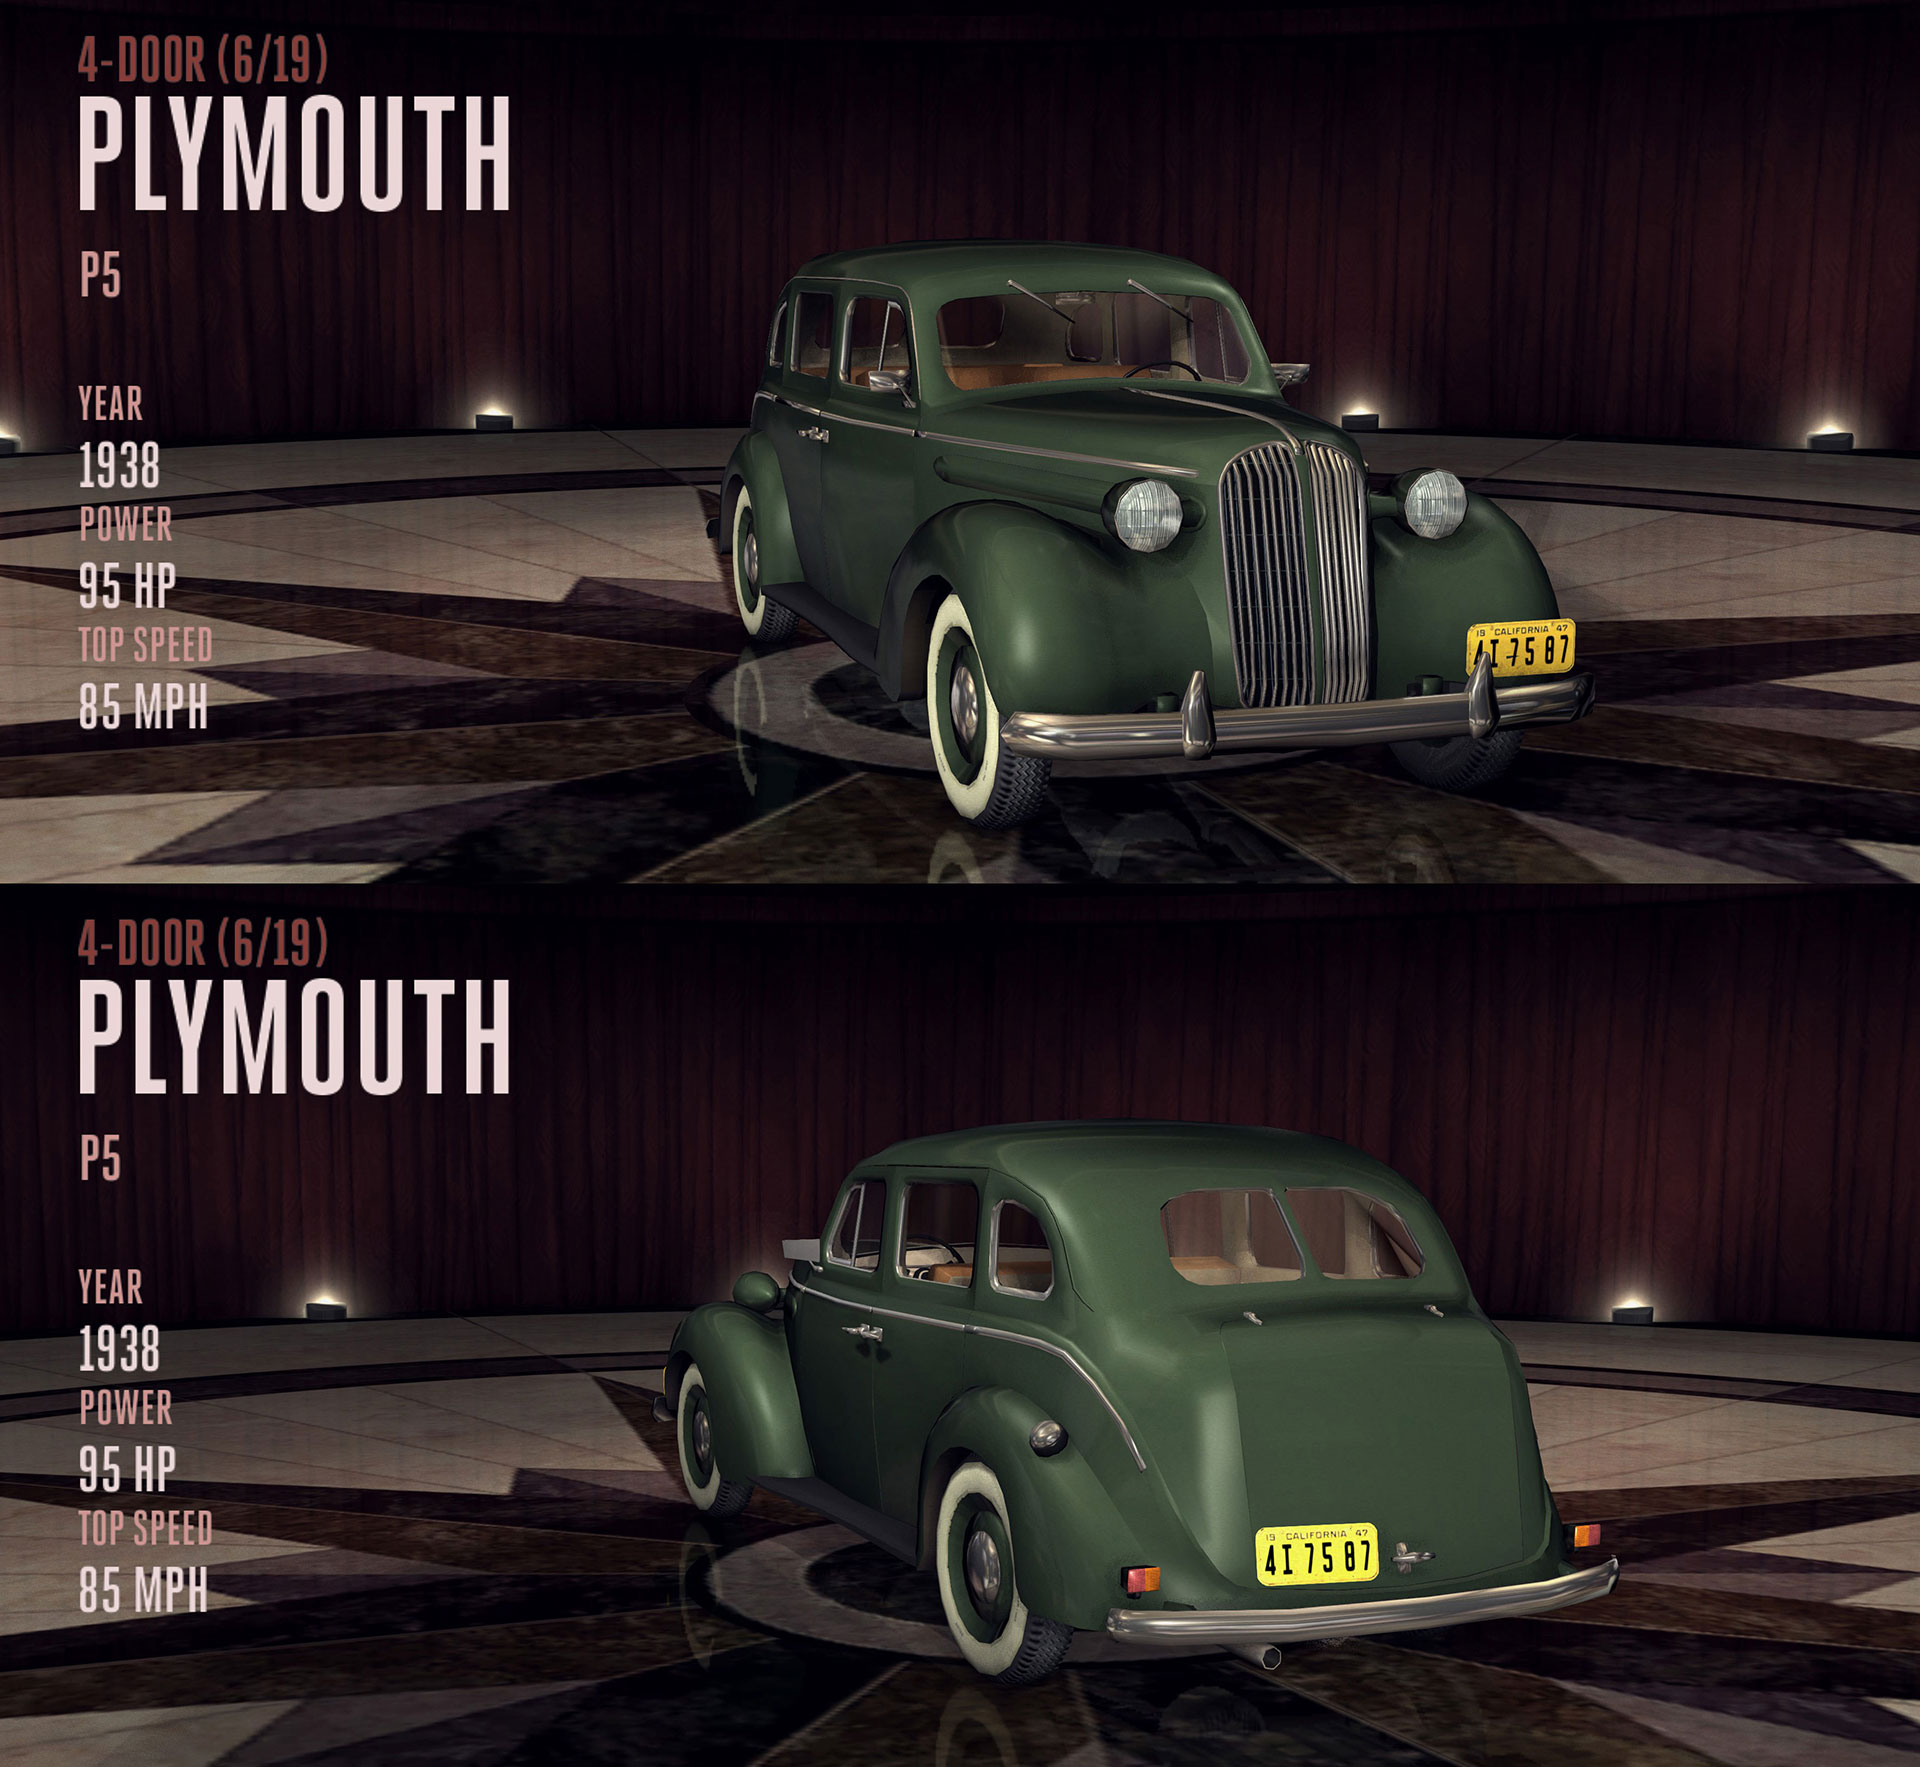 Archivo:1938-plymouth-p5.jpg